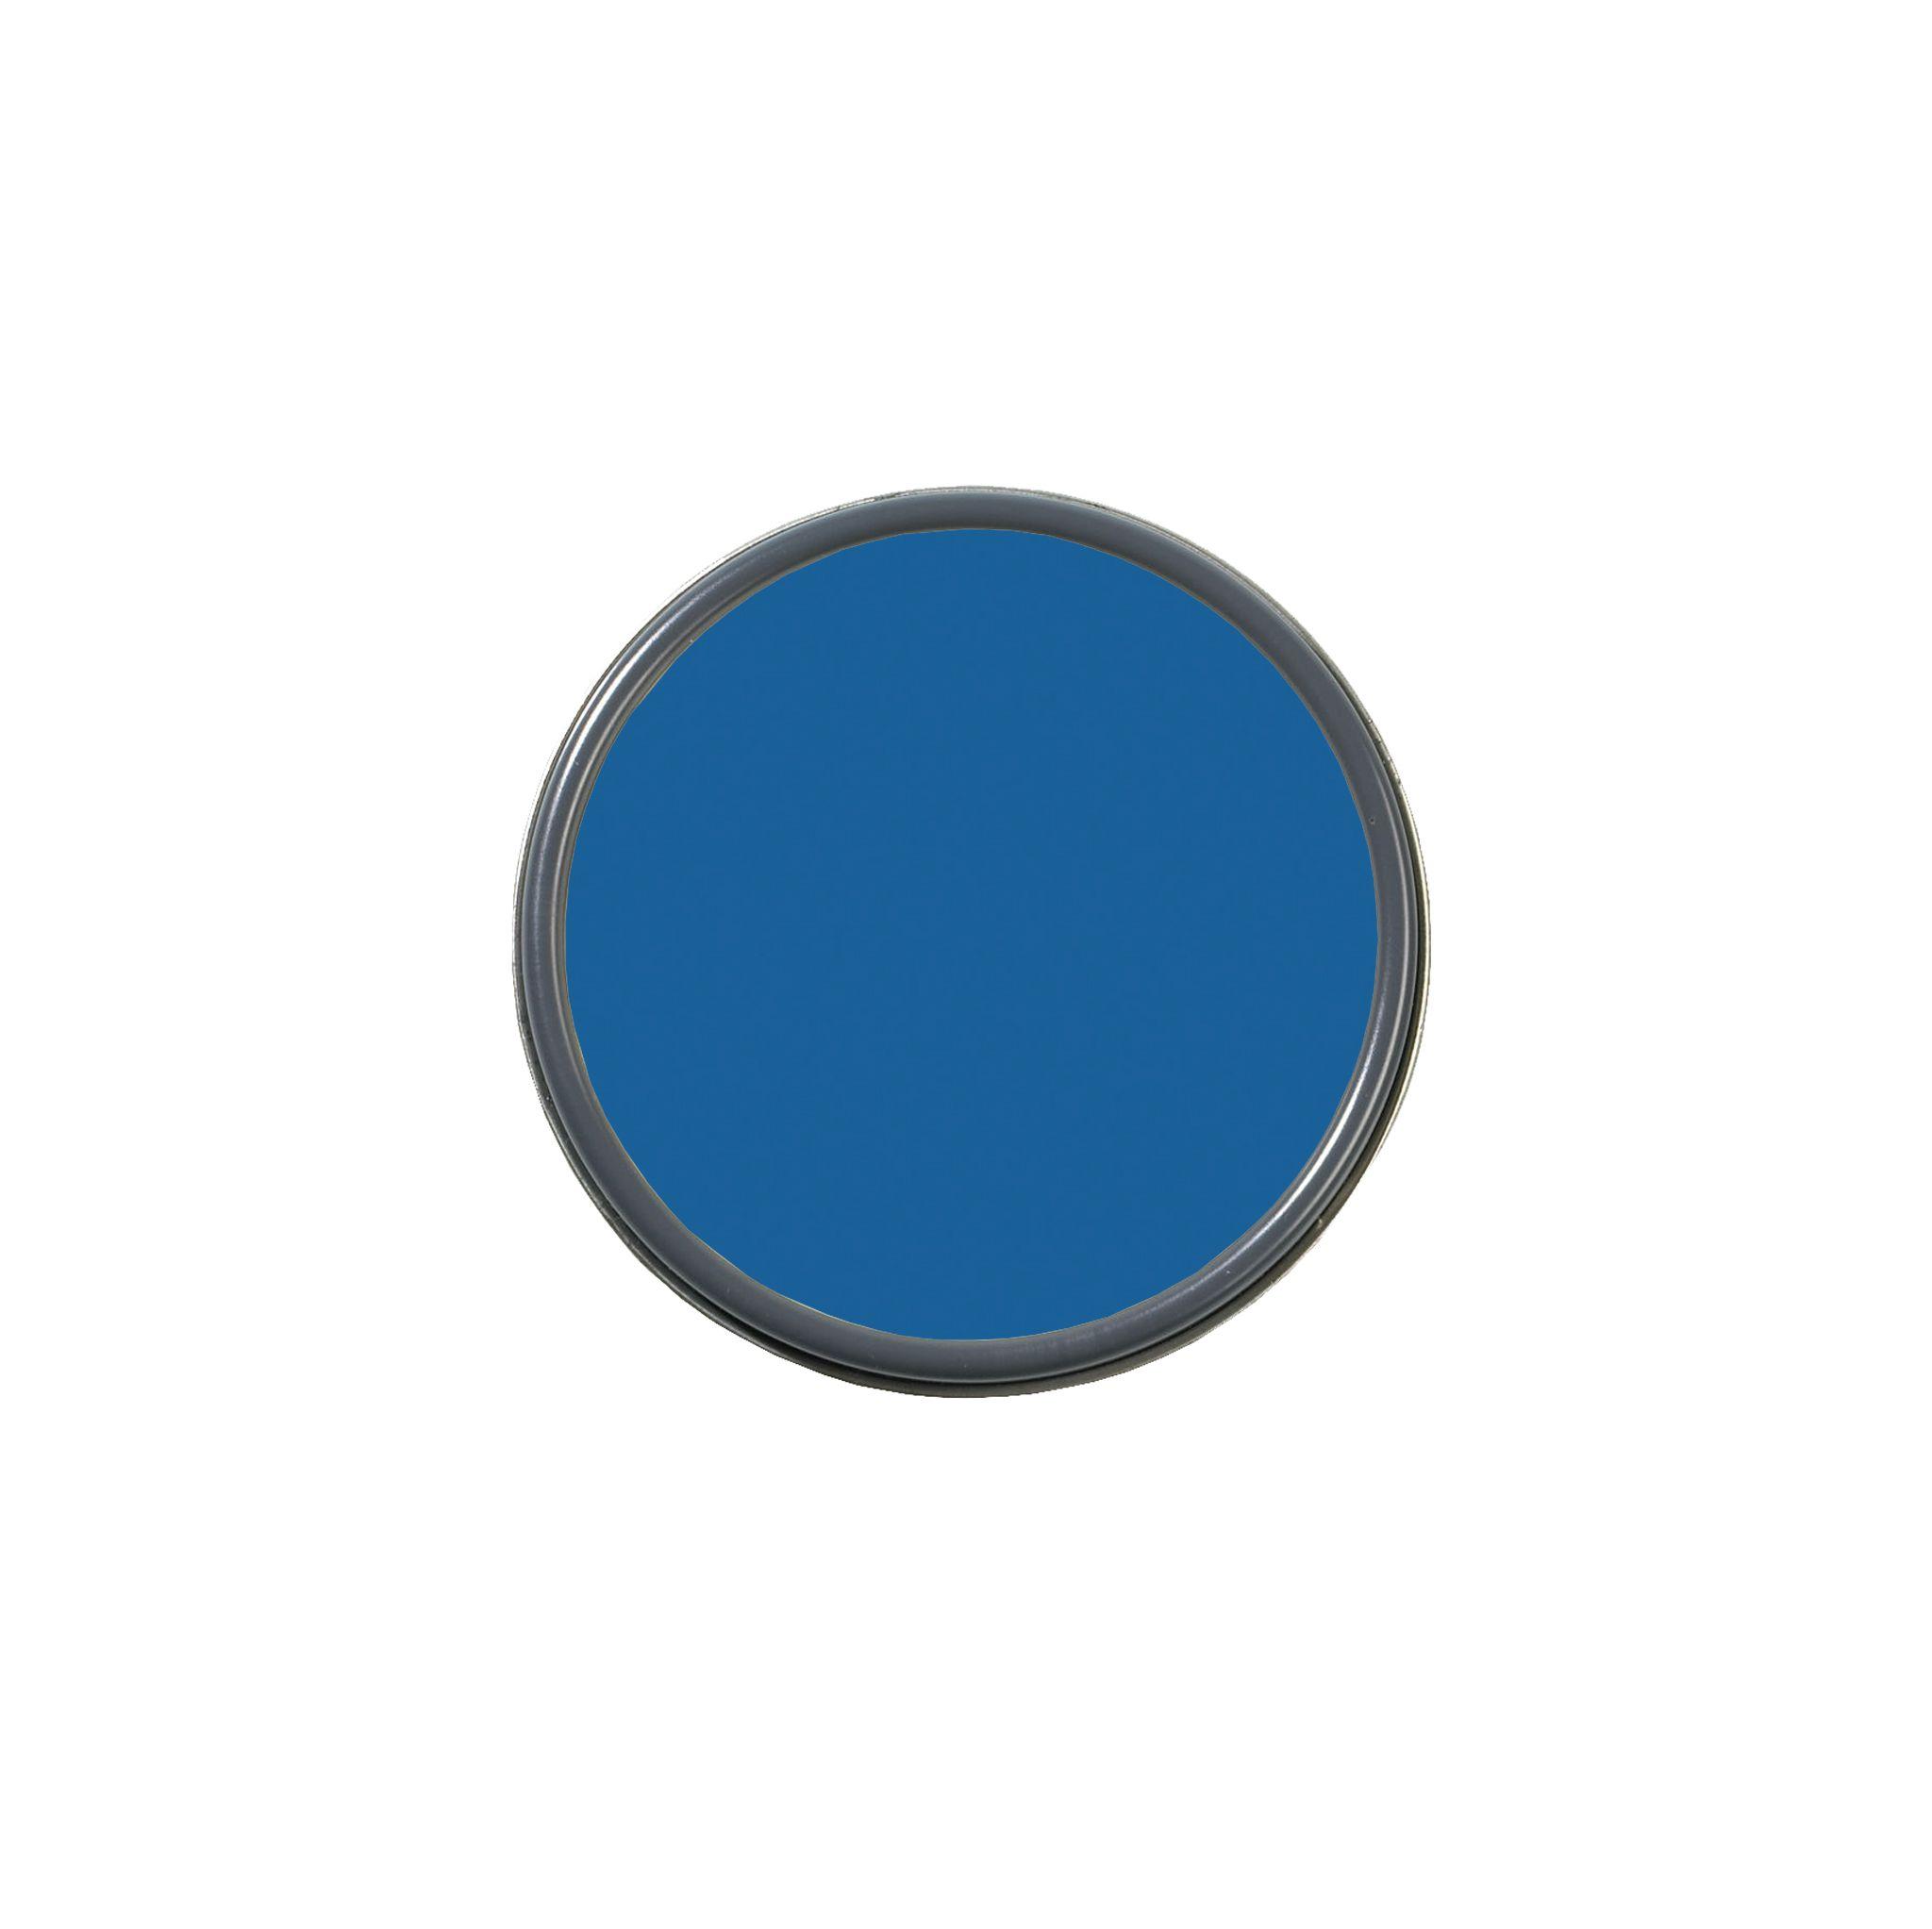 Sherwin Williams - Hyper Blue